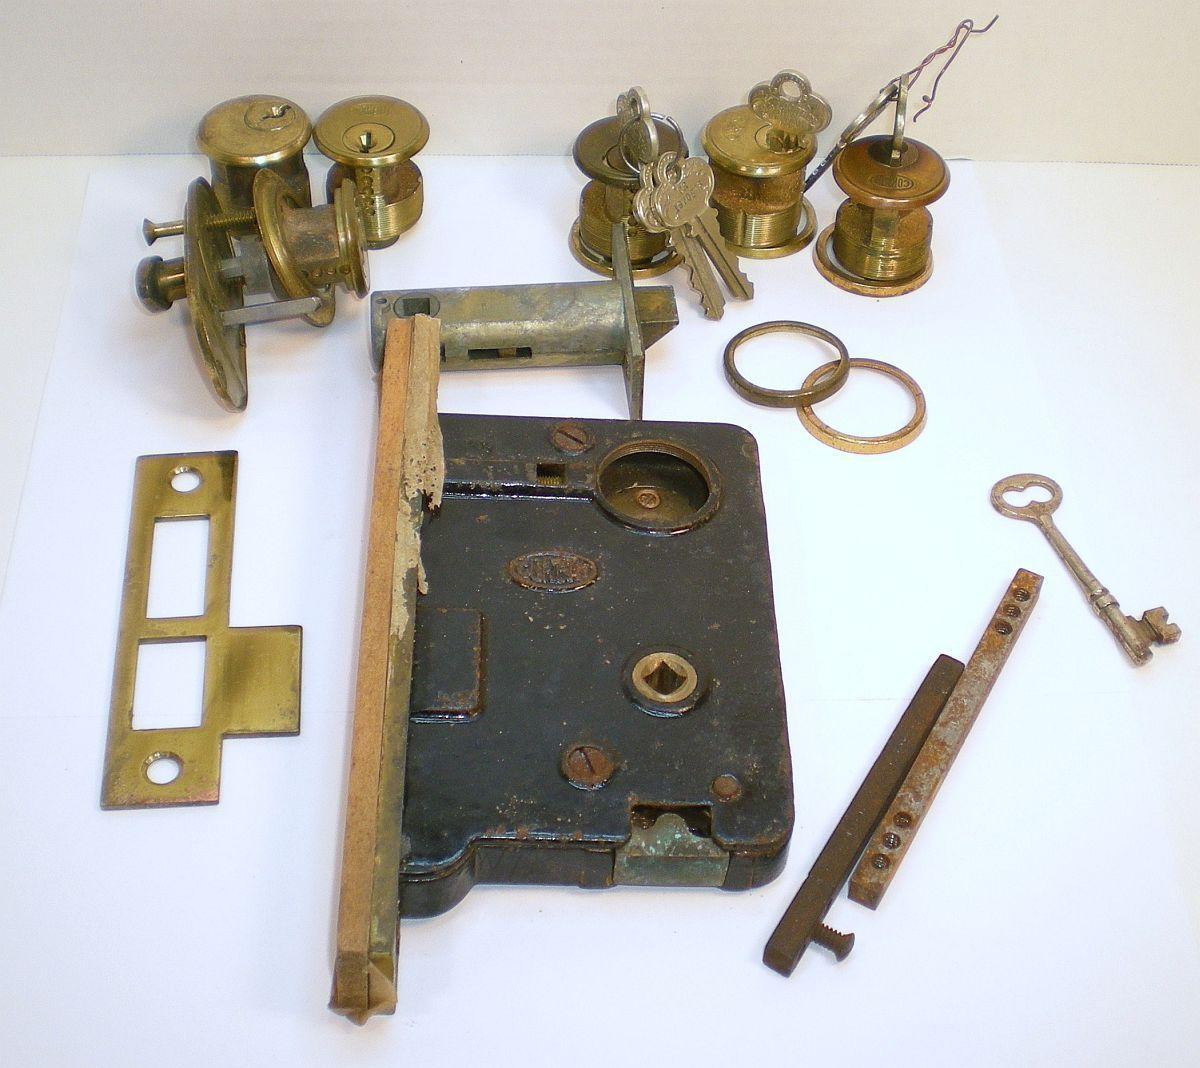 Corbin mortise 1920s vintage door hardware locks keys Lot unused ...